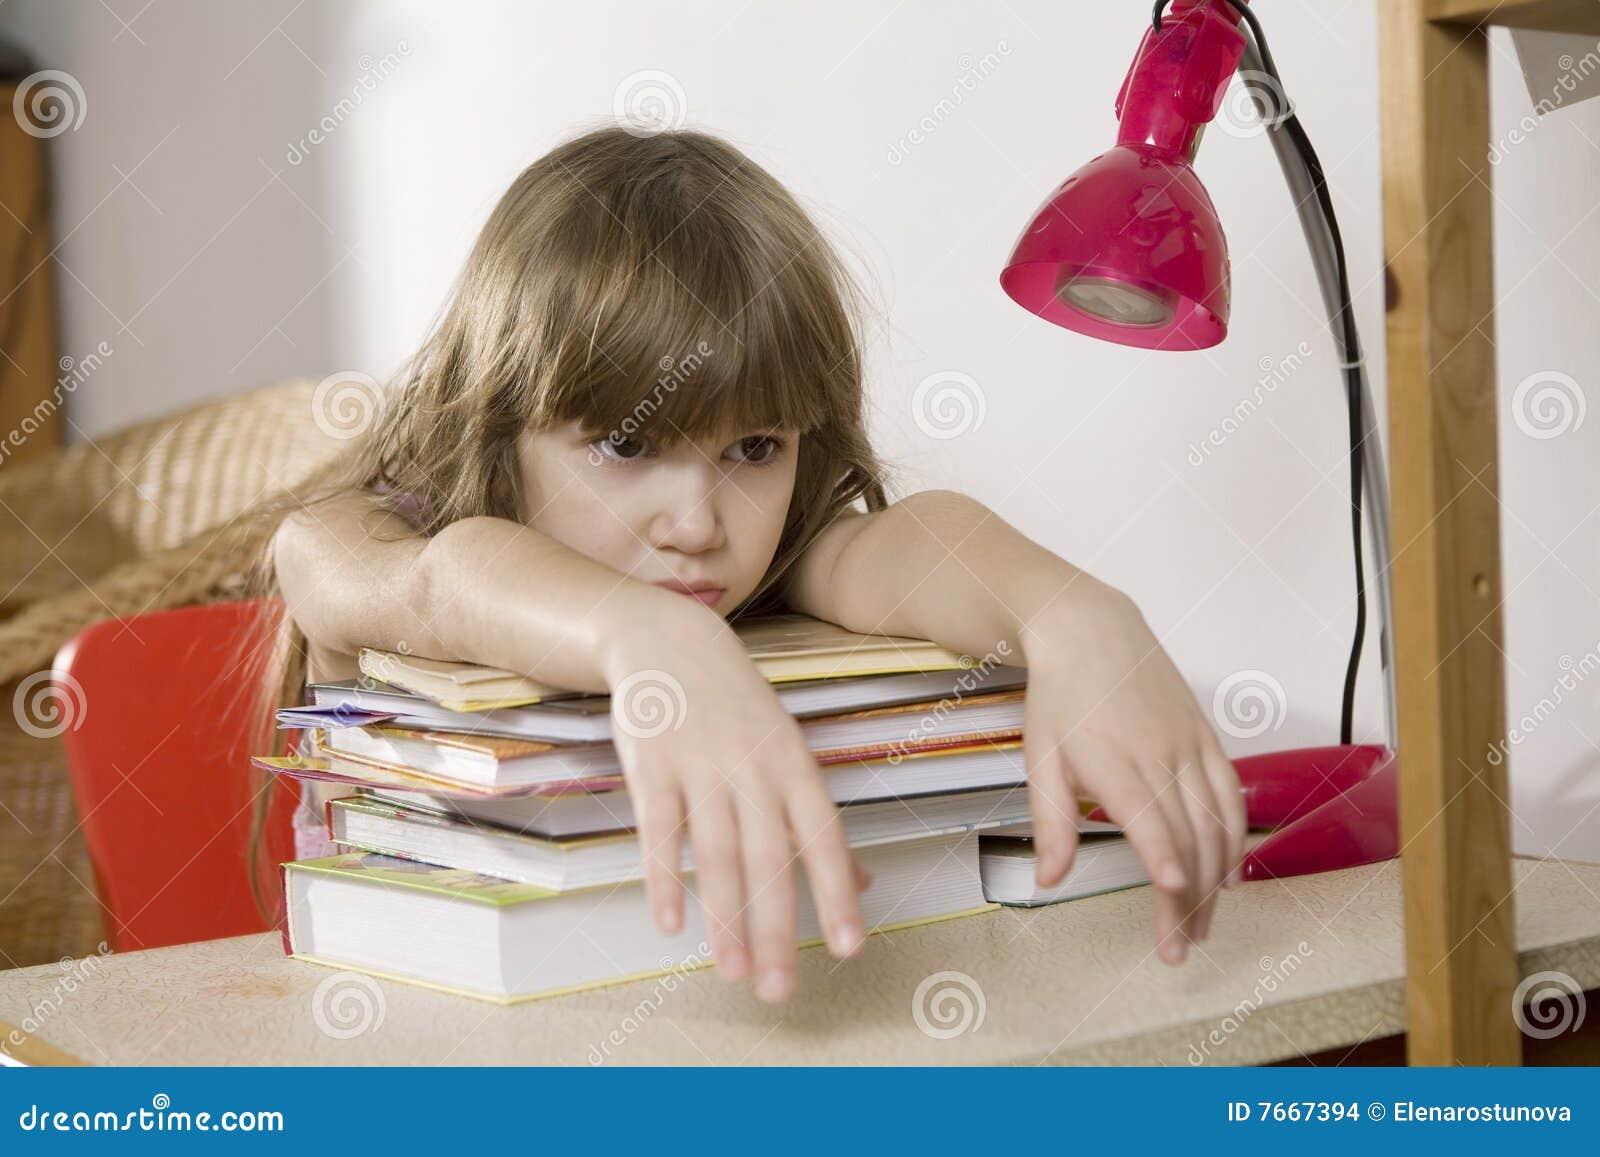 Фото порки девочки 1 фотография